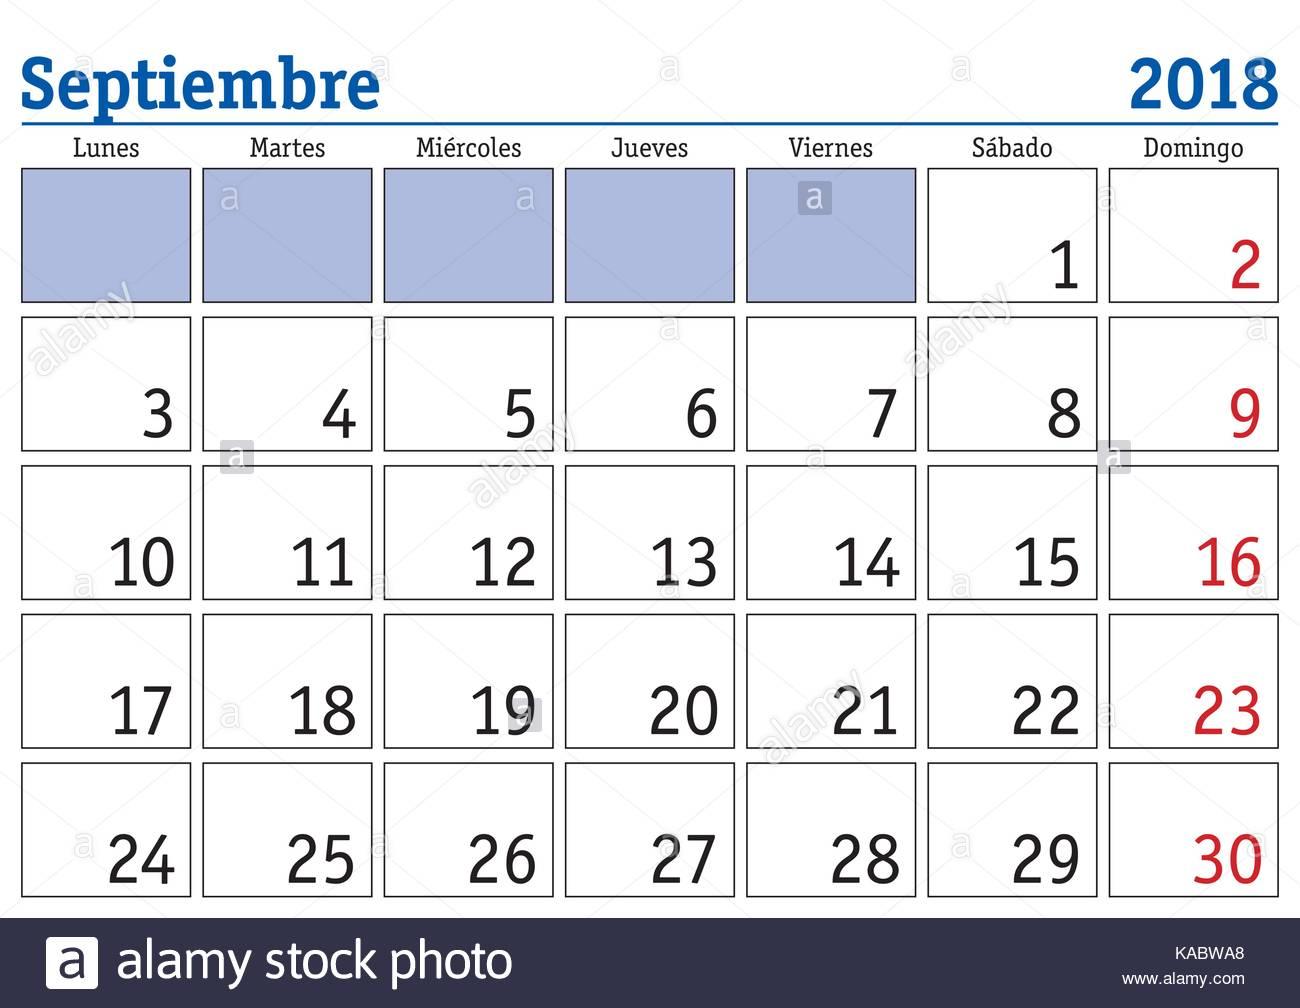 september month calendar 2018